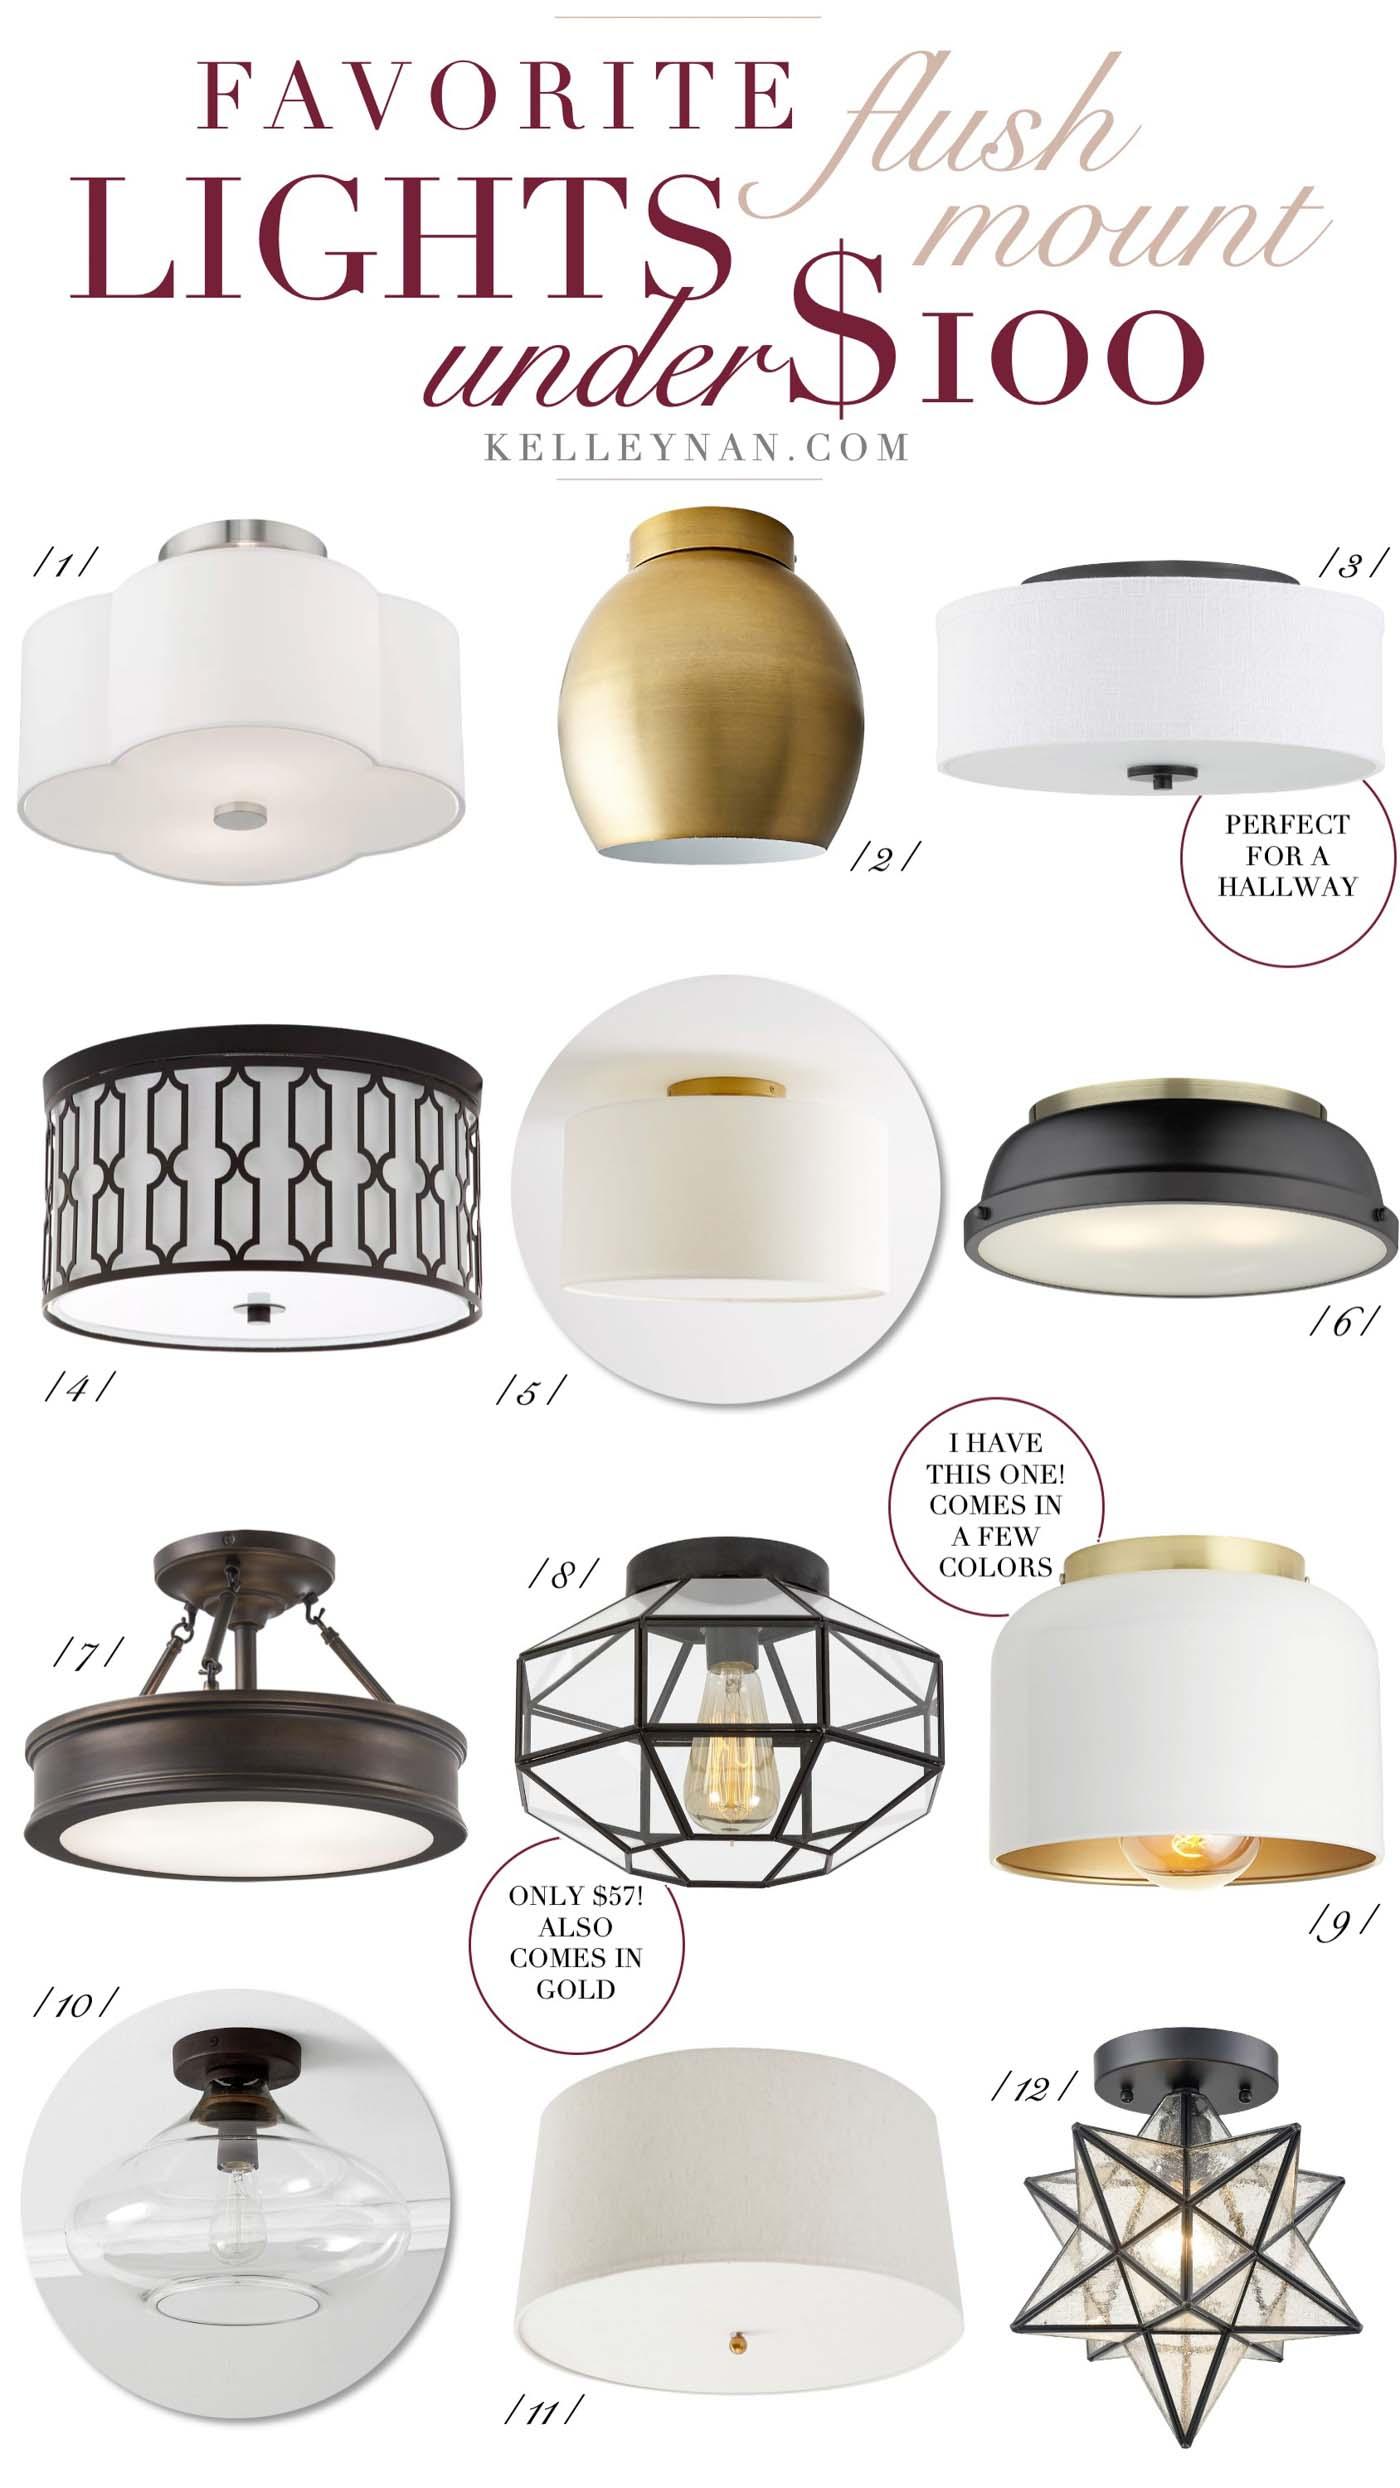 inexpensive flush mount lighting under